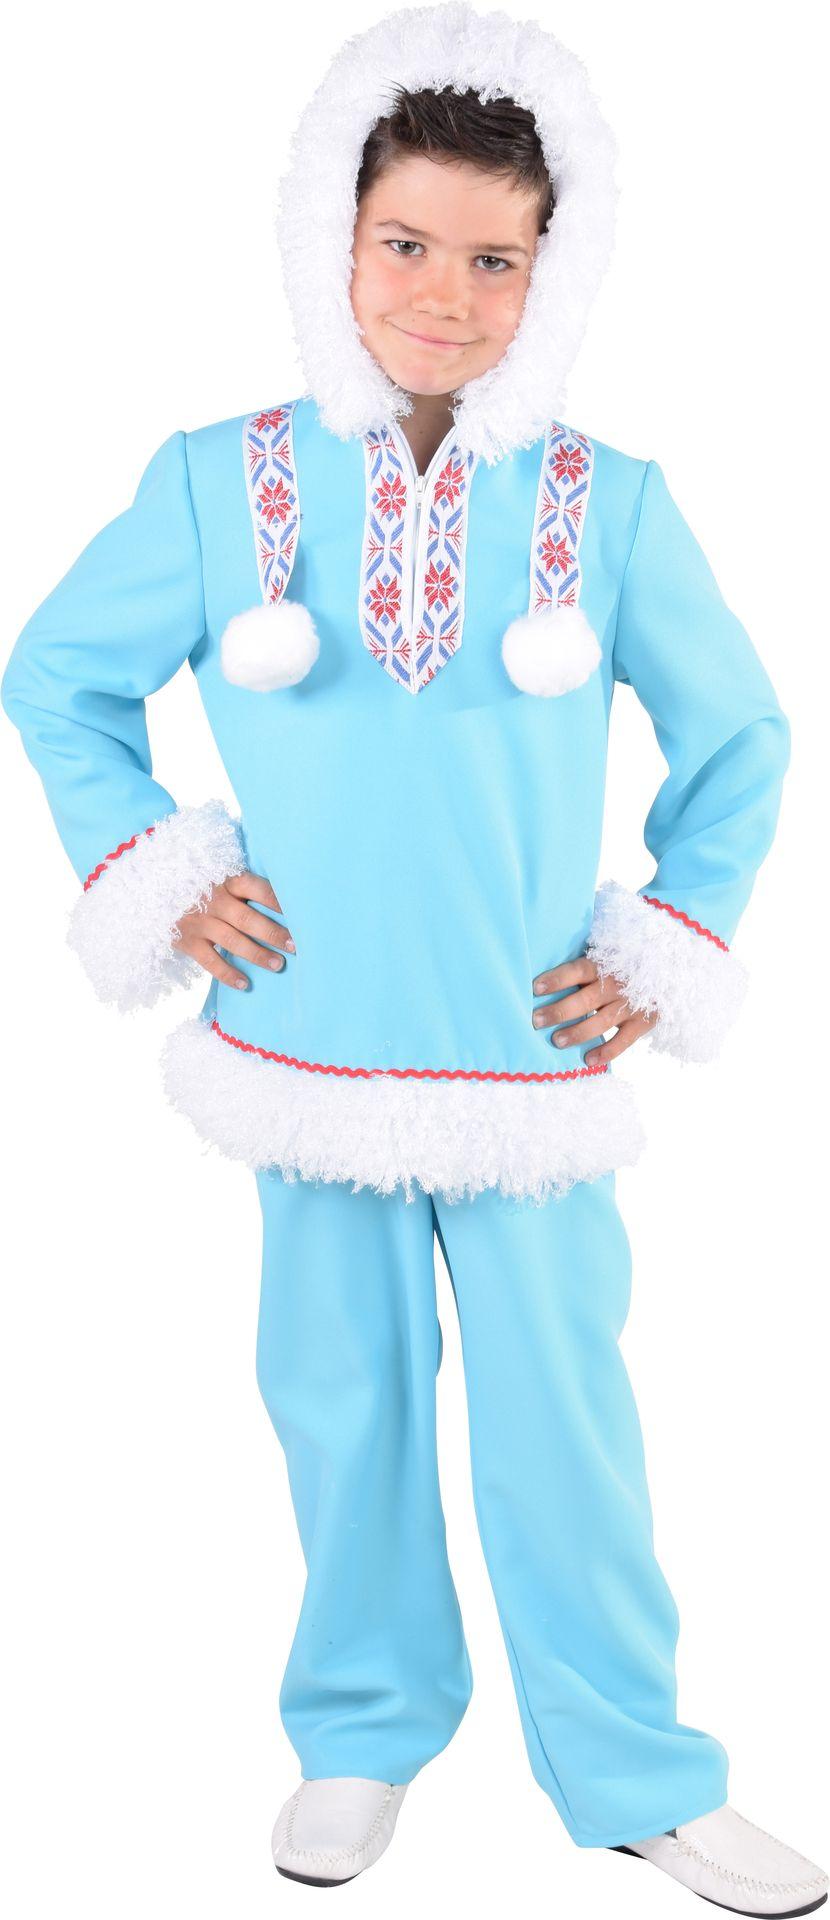 Eskimo kostuum jongens blauw